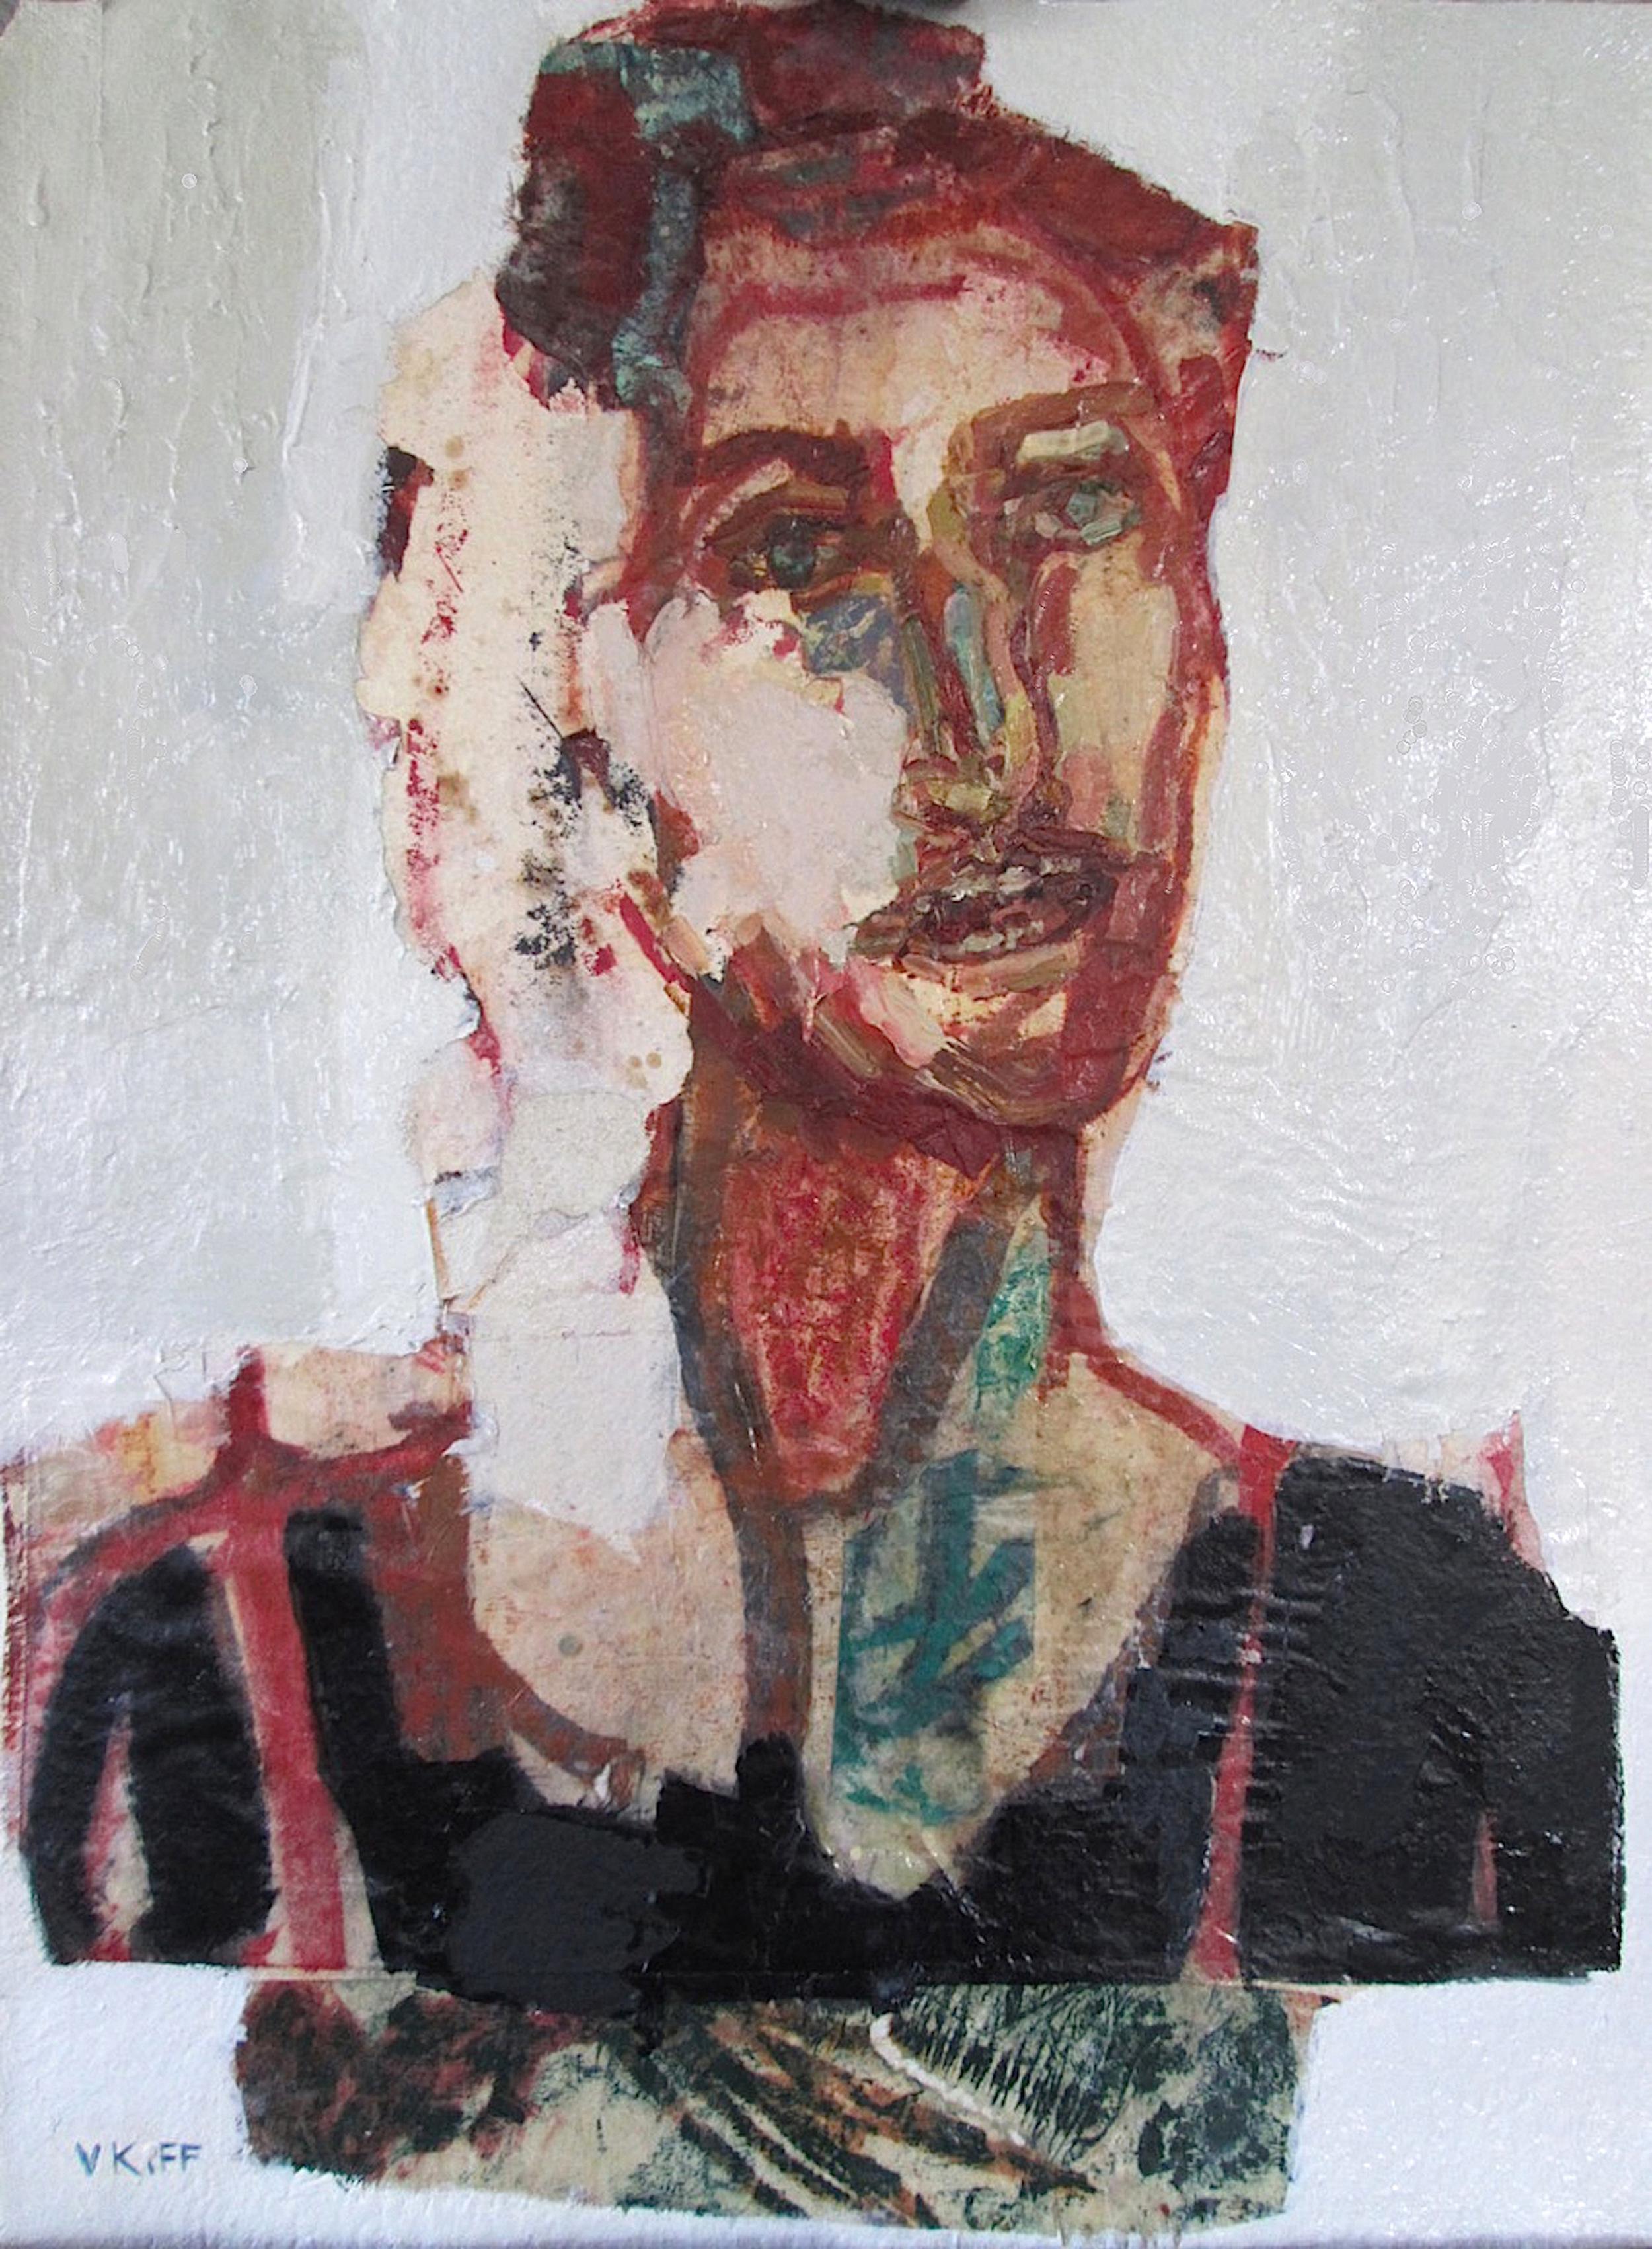 Title: The Horseman  Size: 72 x 58 cm  Medium: Oil on paper  Price: £1600